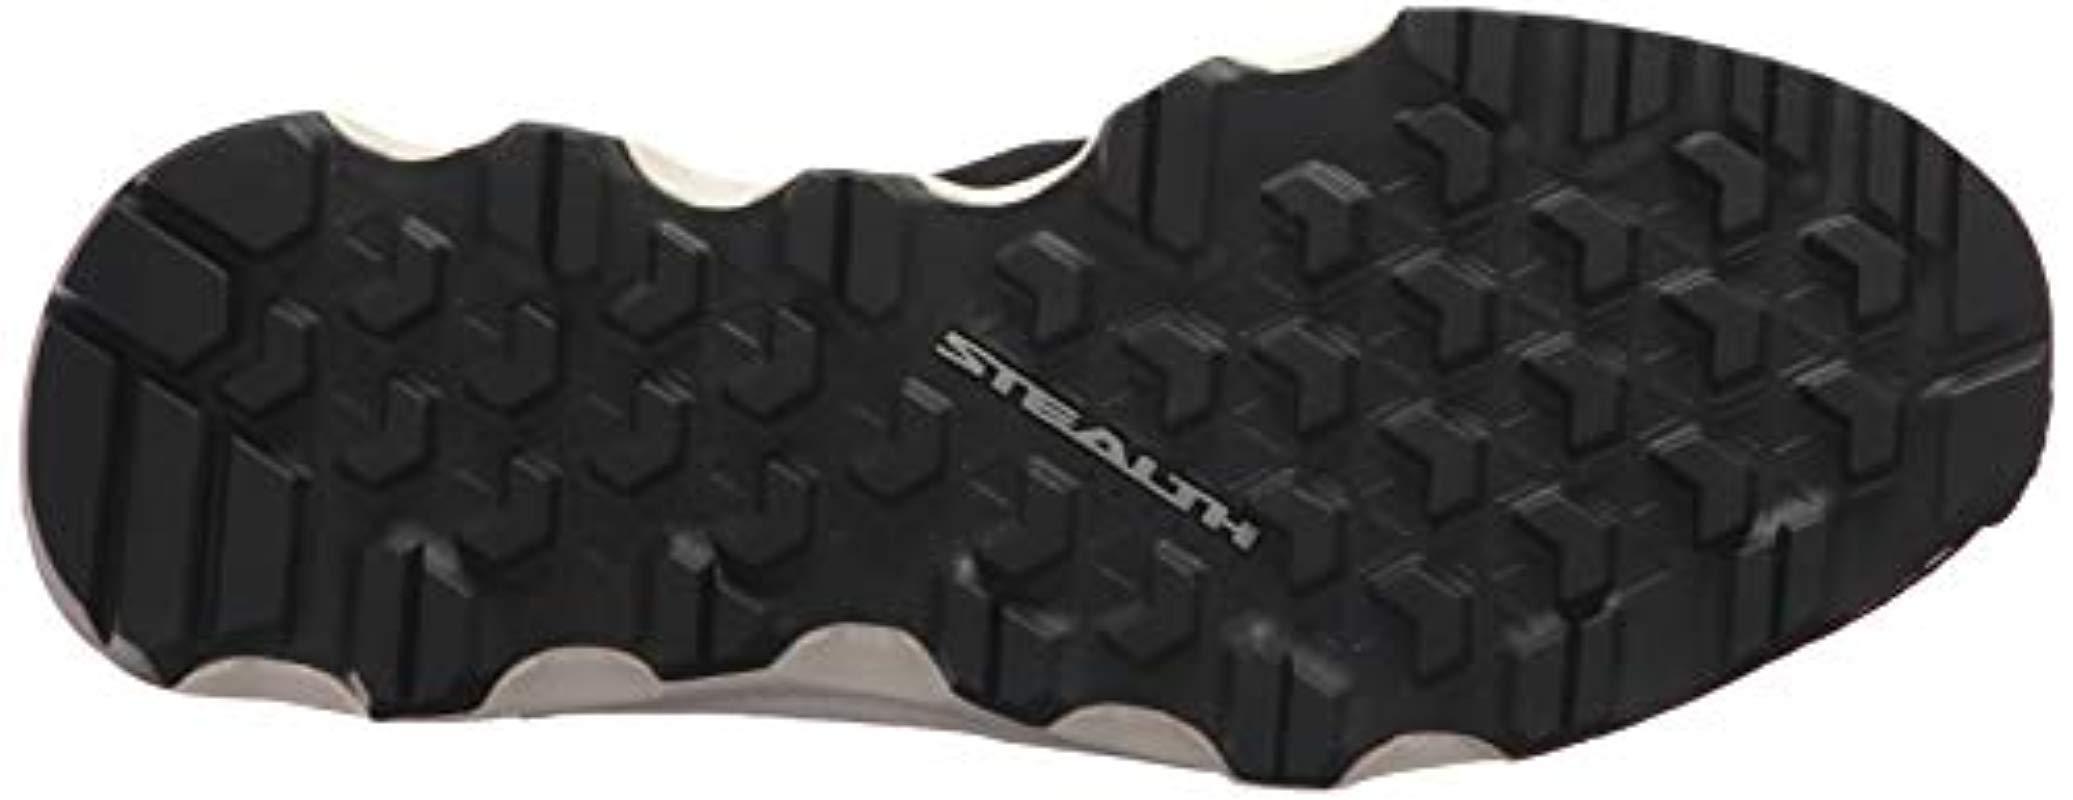 adidas Originals Rubber Adidas Sport Performance Terrex Cc Voyager Sleek Sneakers in Black/Black/Chalk White (Black)